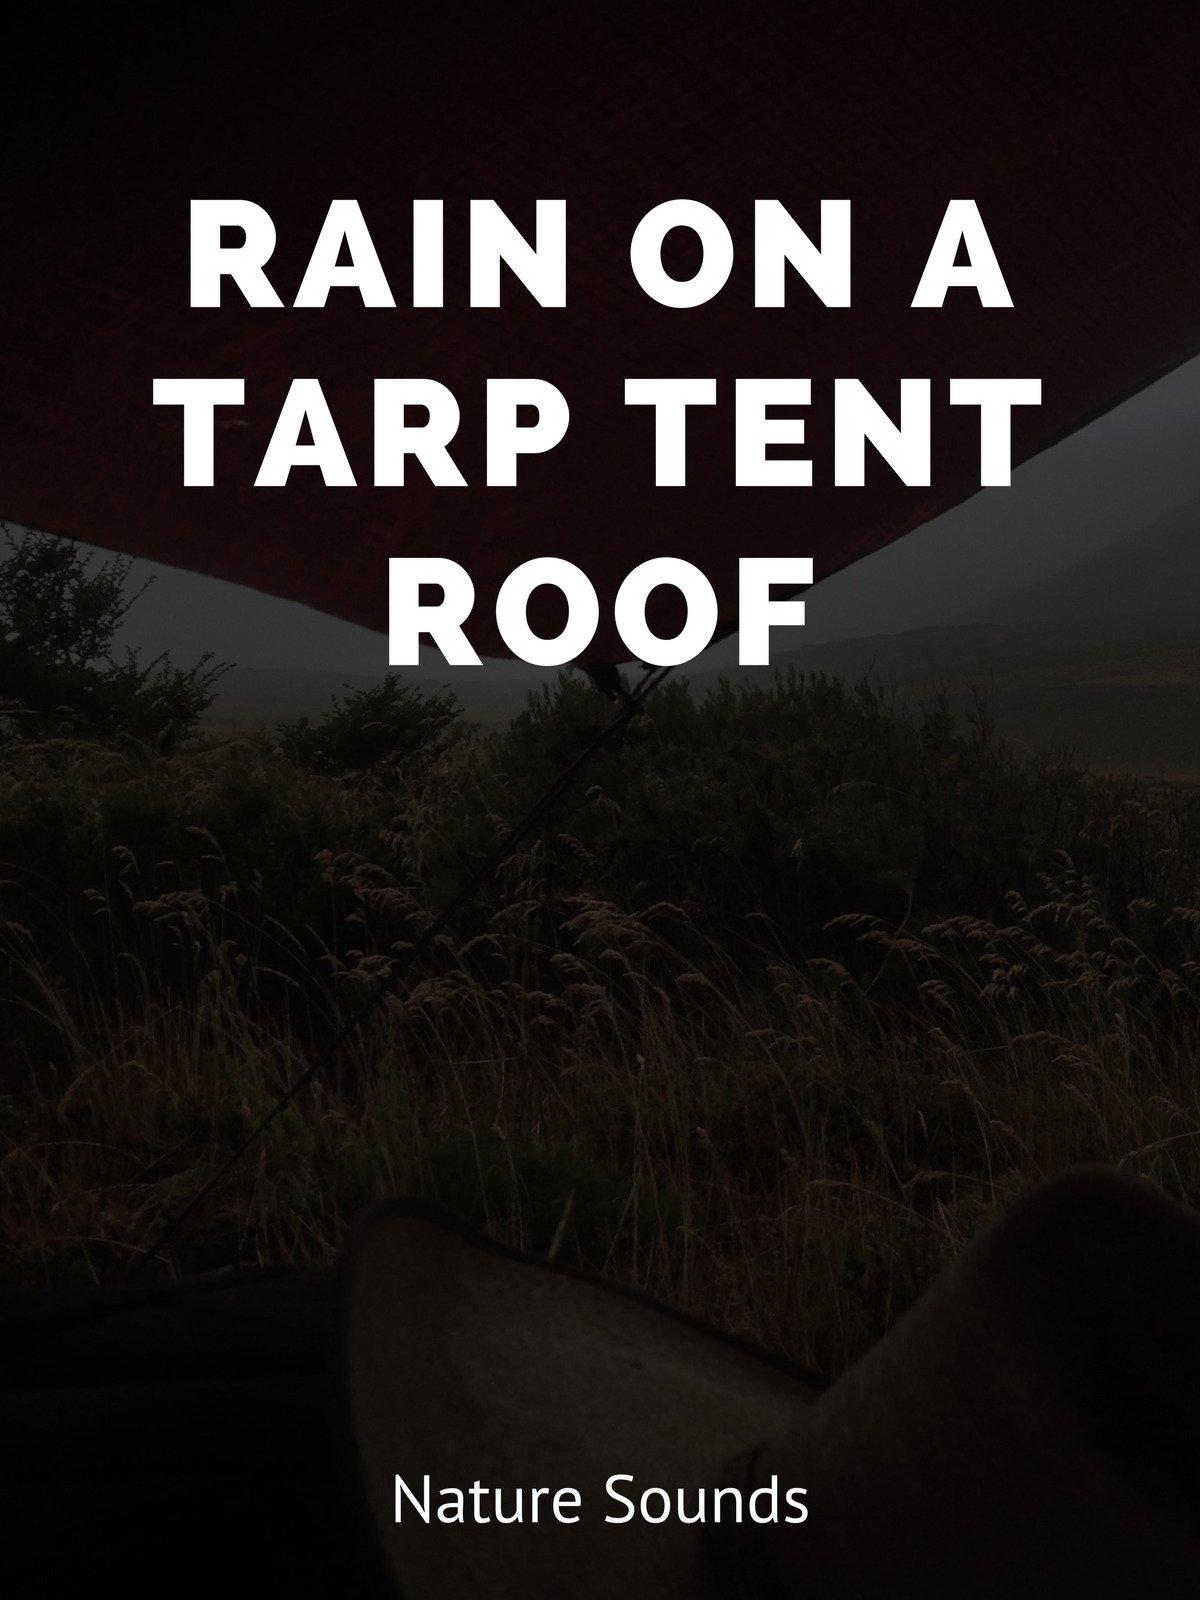 Rain on a Tarp Tent Roof